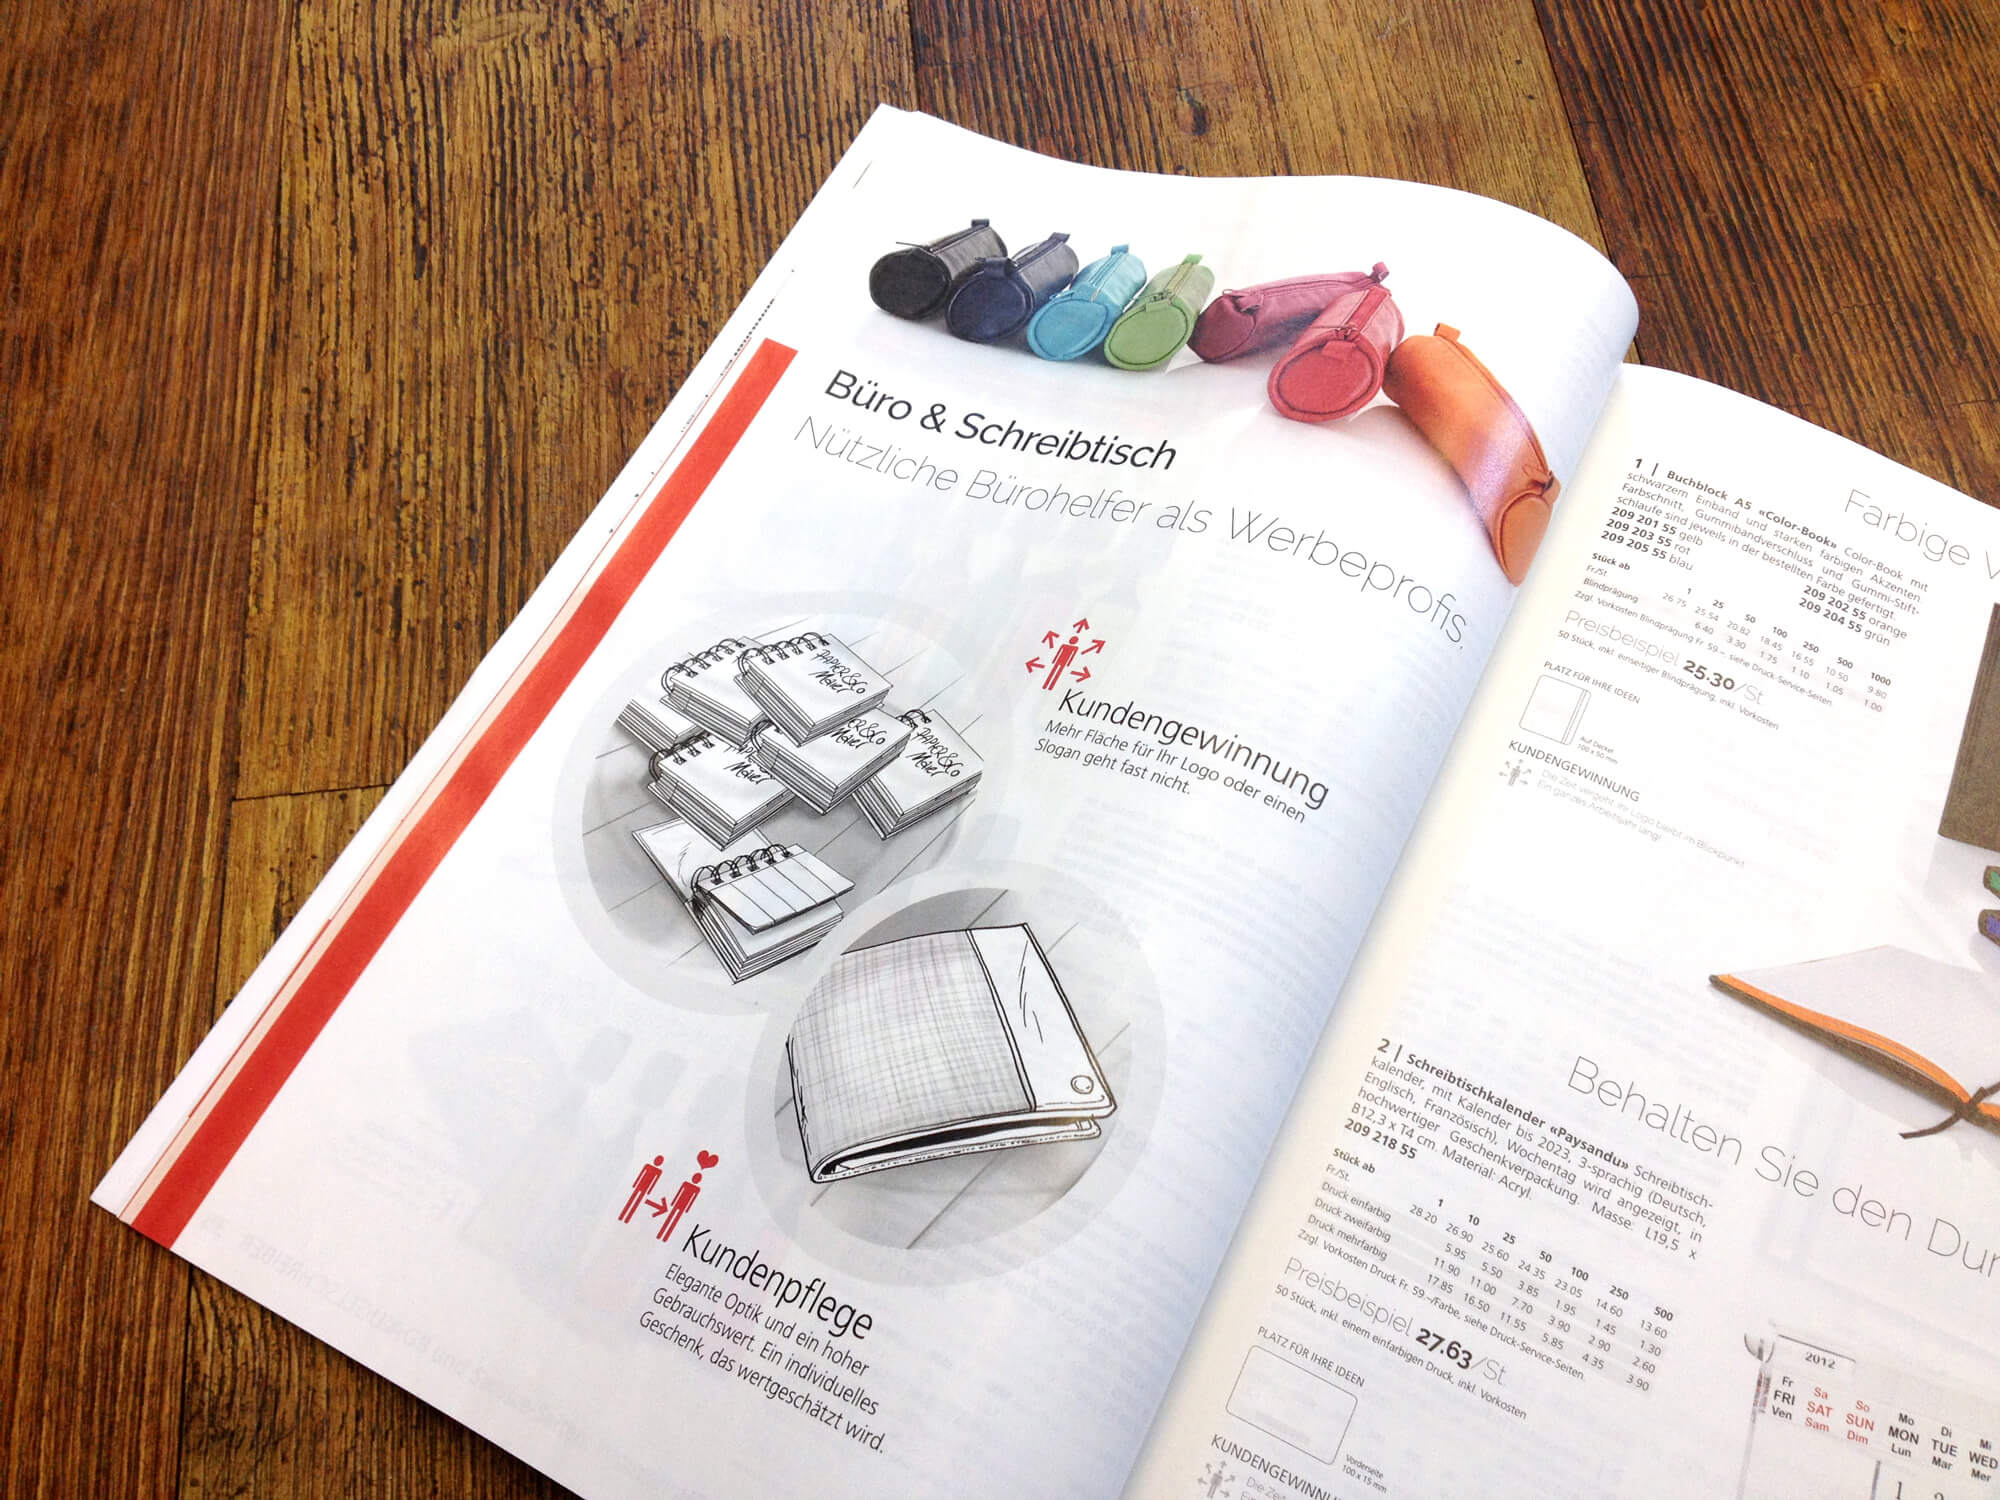 Hach katalog herbst 2015 bzweic for Hach katalog